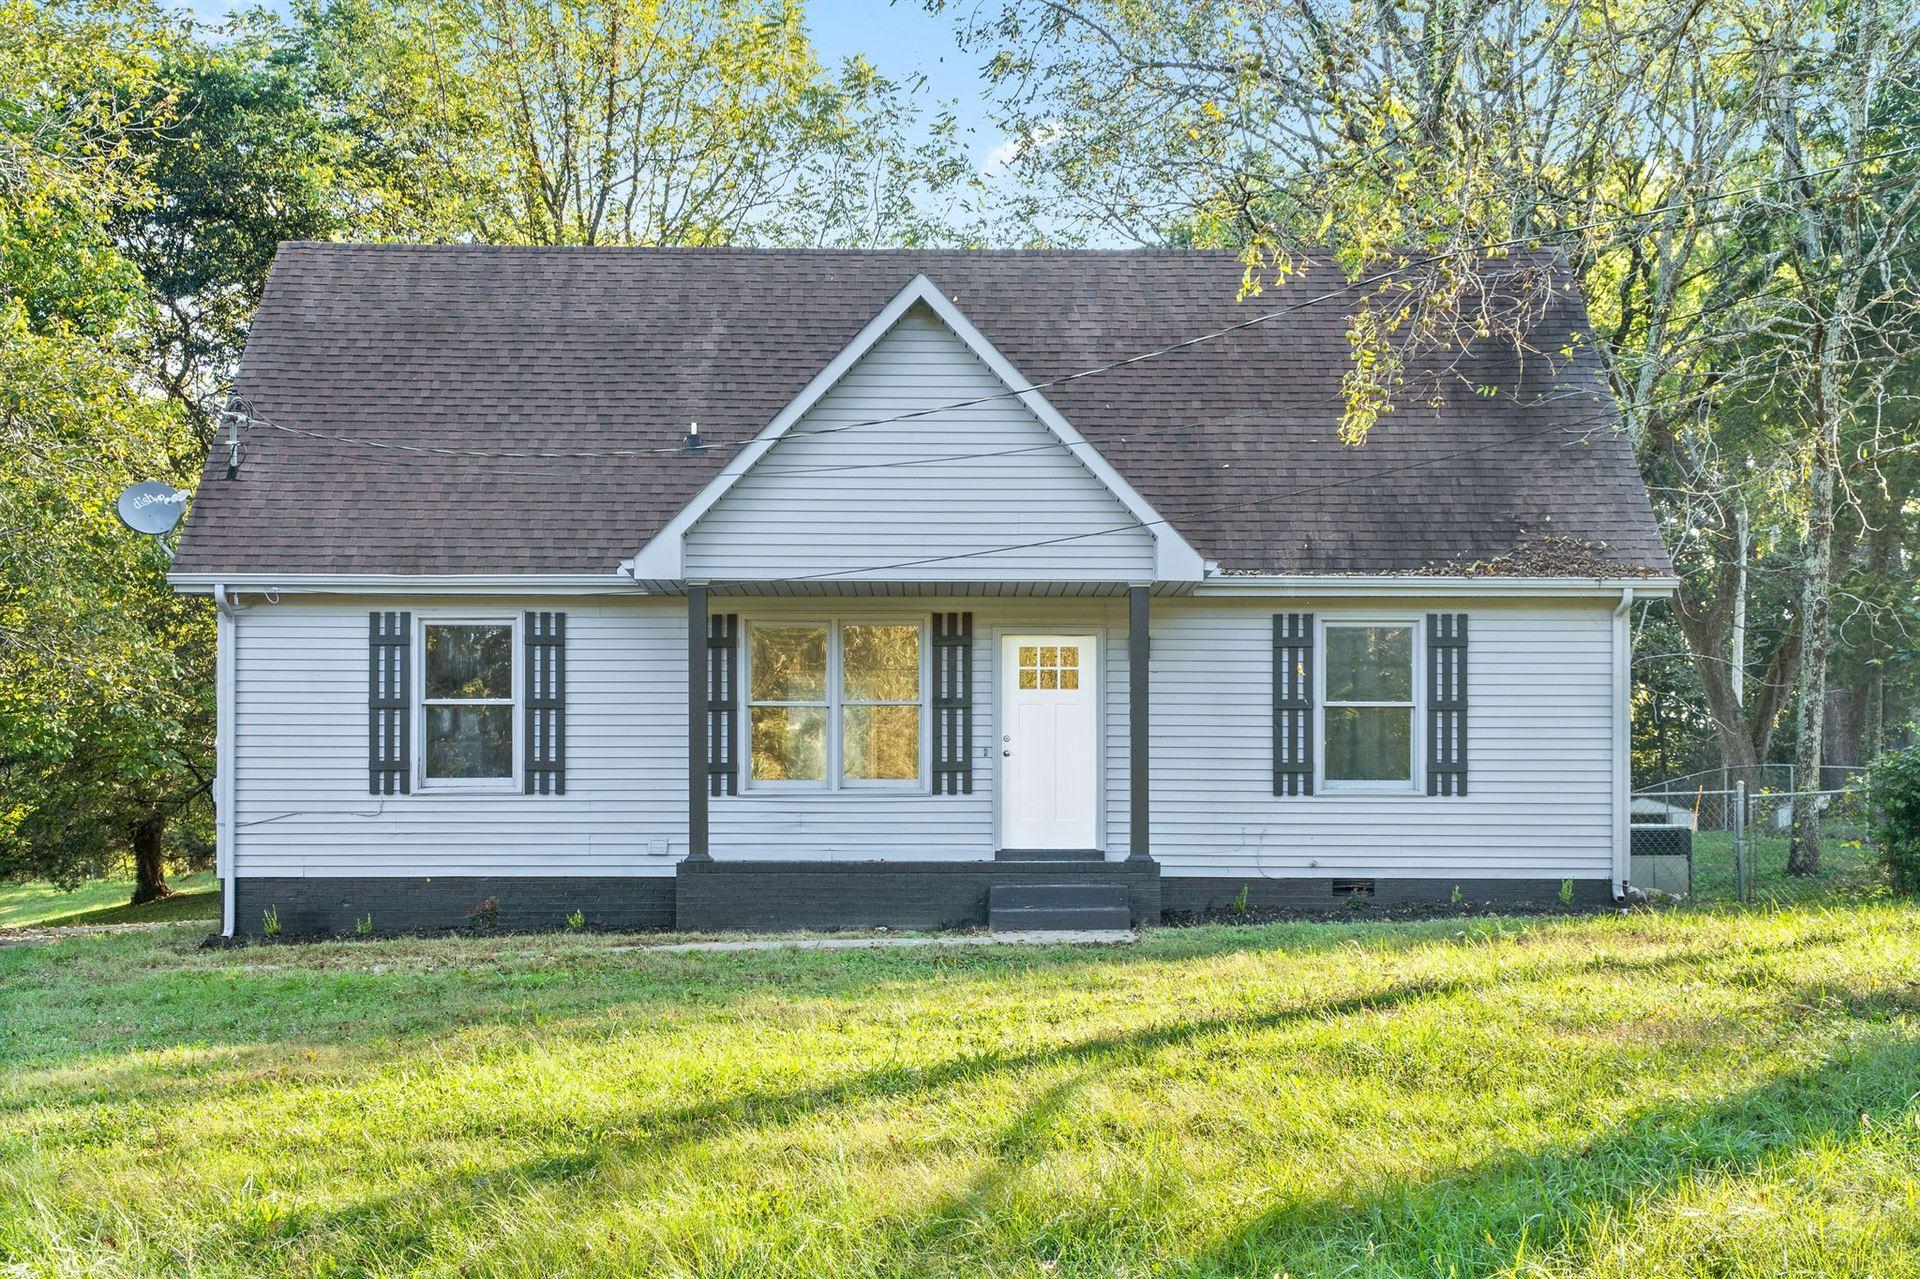 1875 Cumberland Heights Rd, Clarksville, TN 37040 - MLS#: 2299381